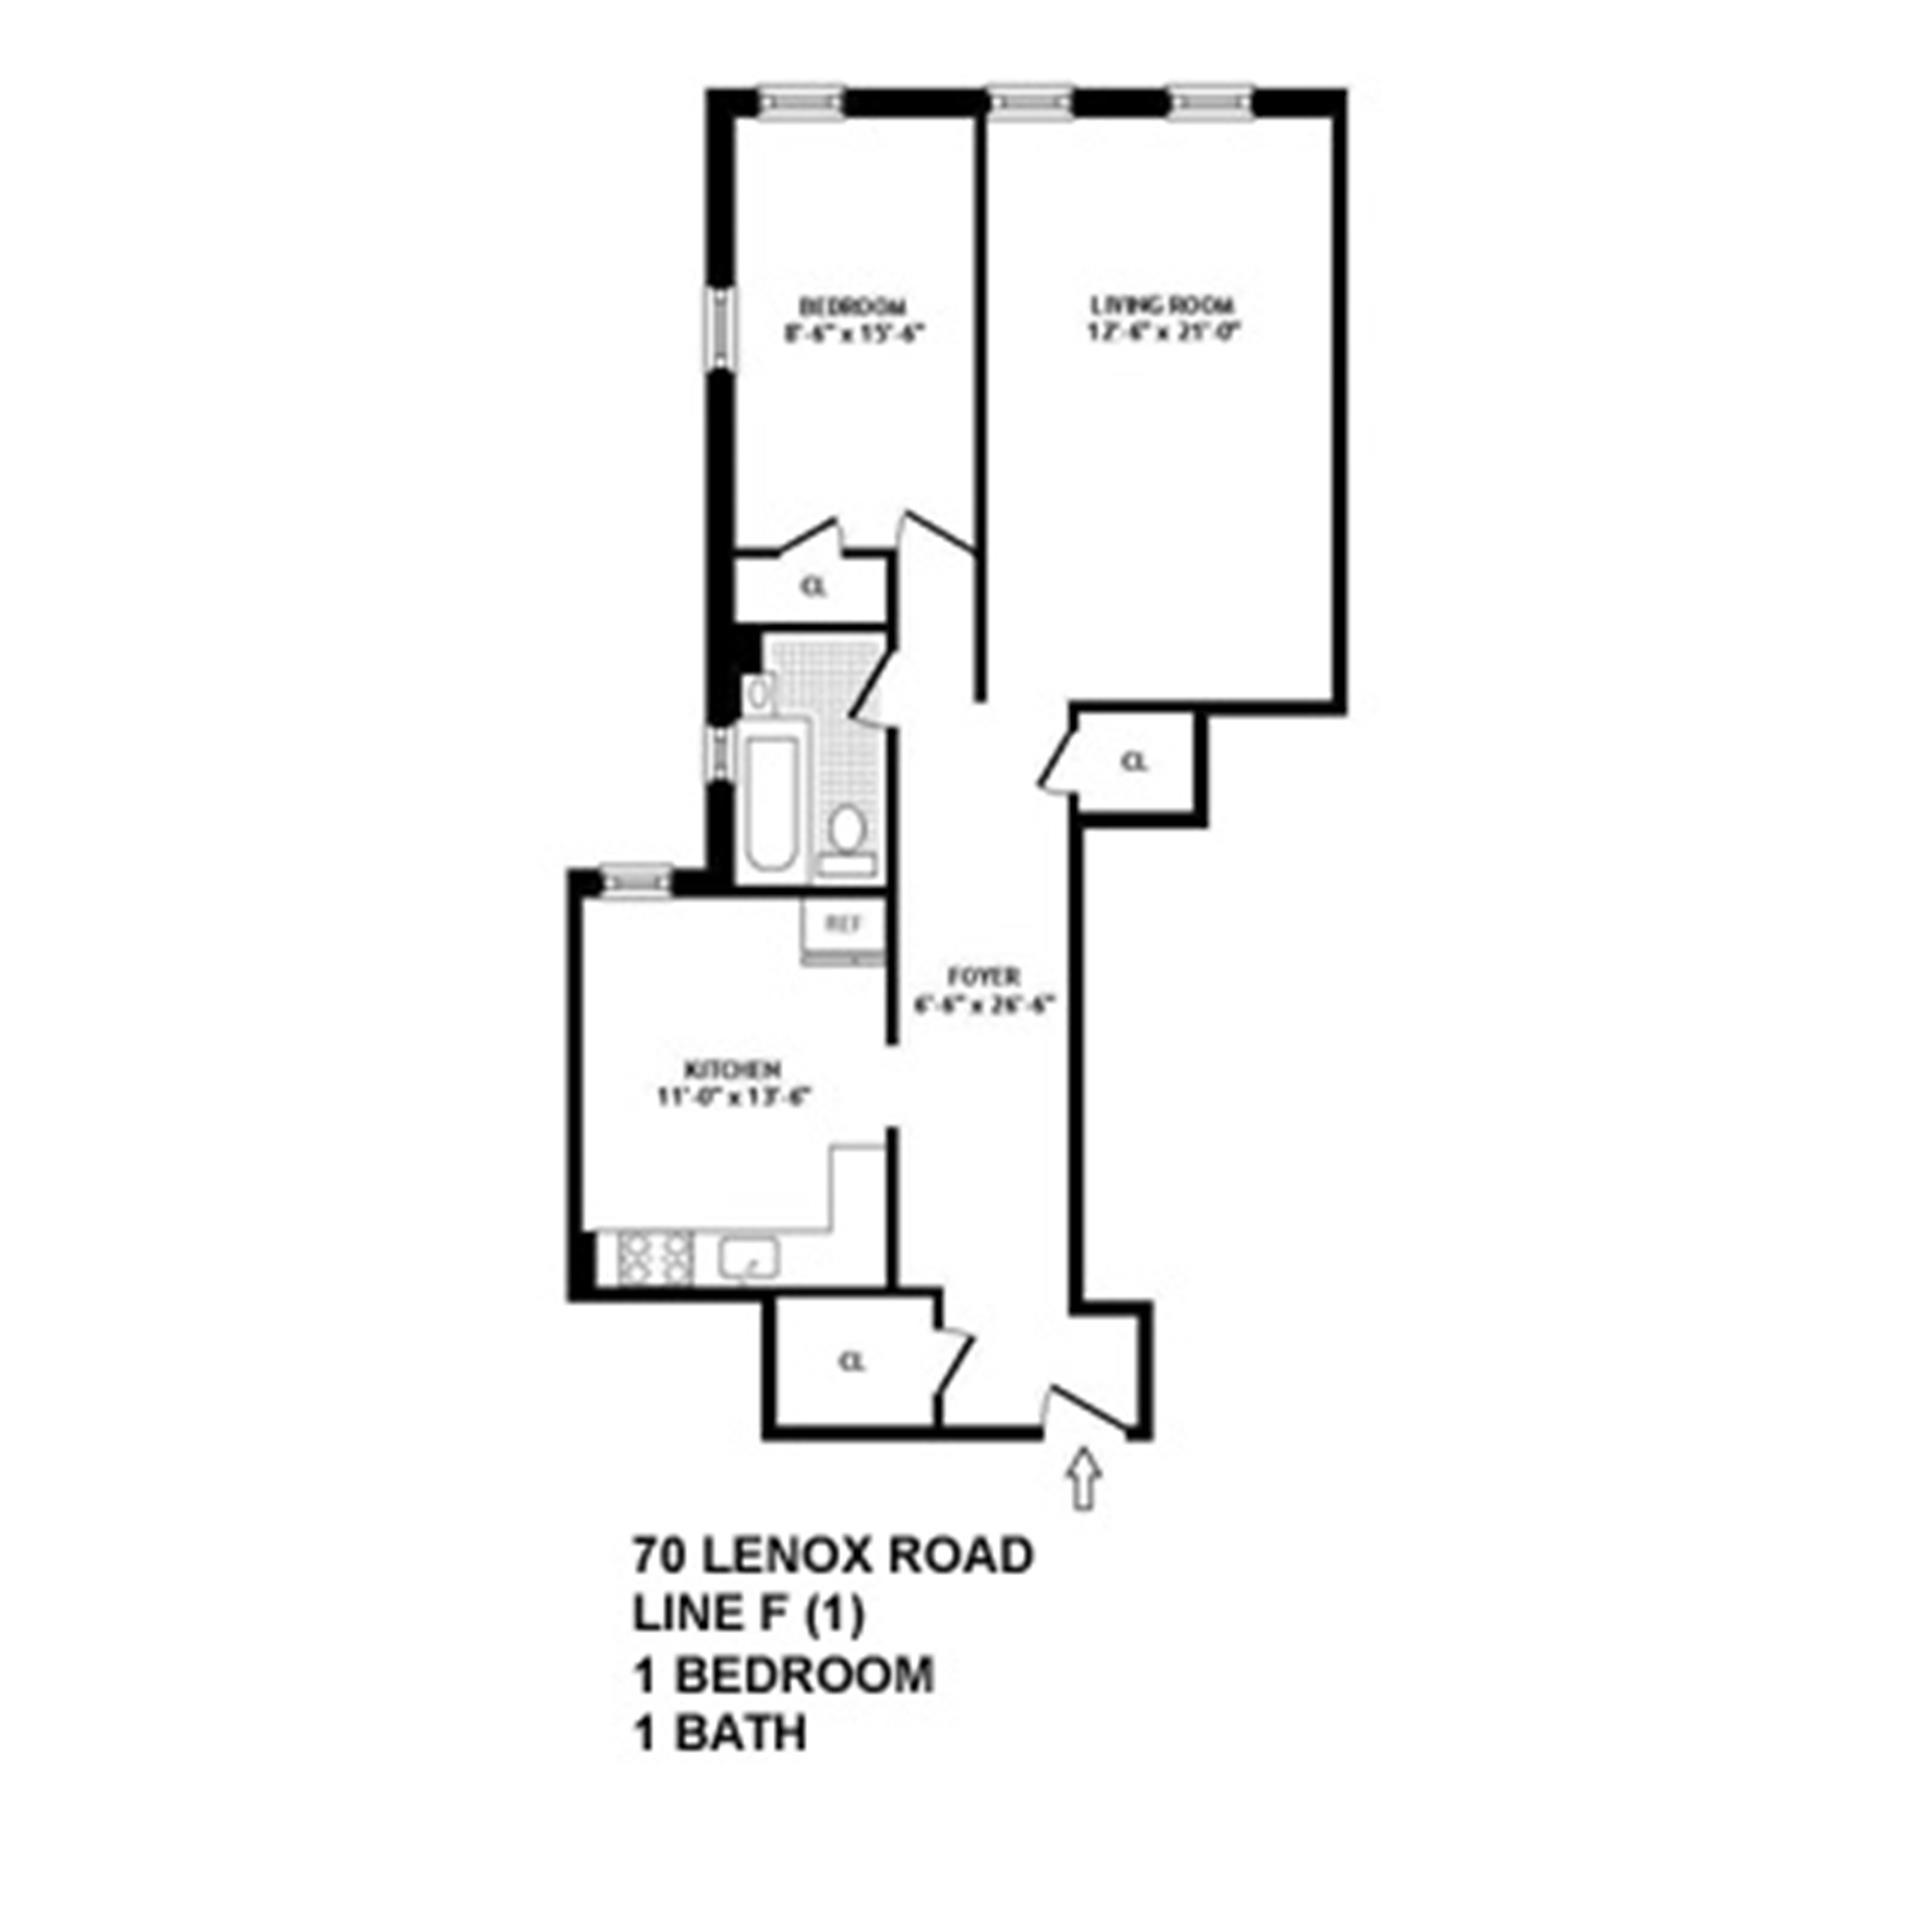 Floor plan of 70 Lenox Rd, F1 - Prospect-Lefferts Gardens, New York